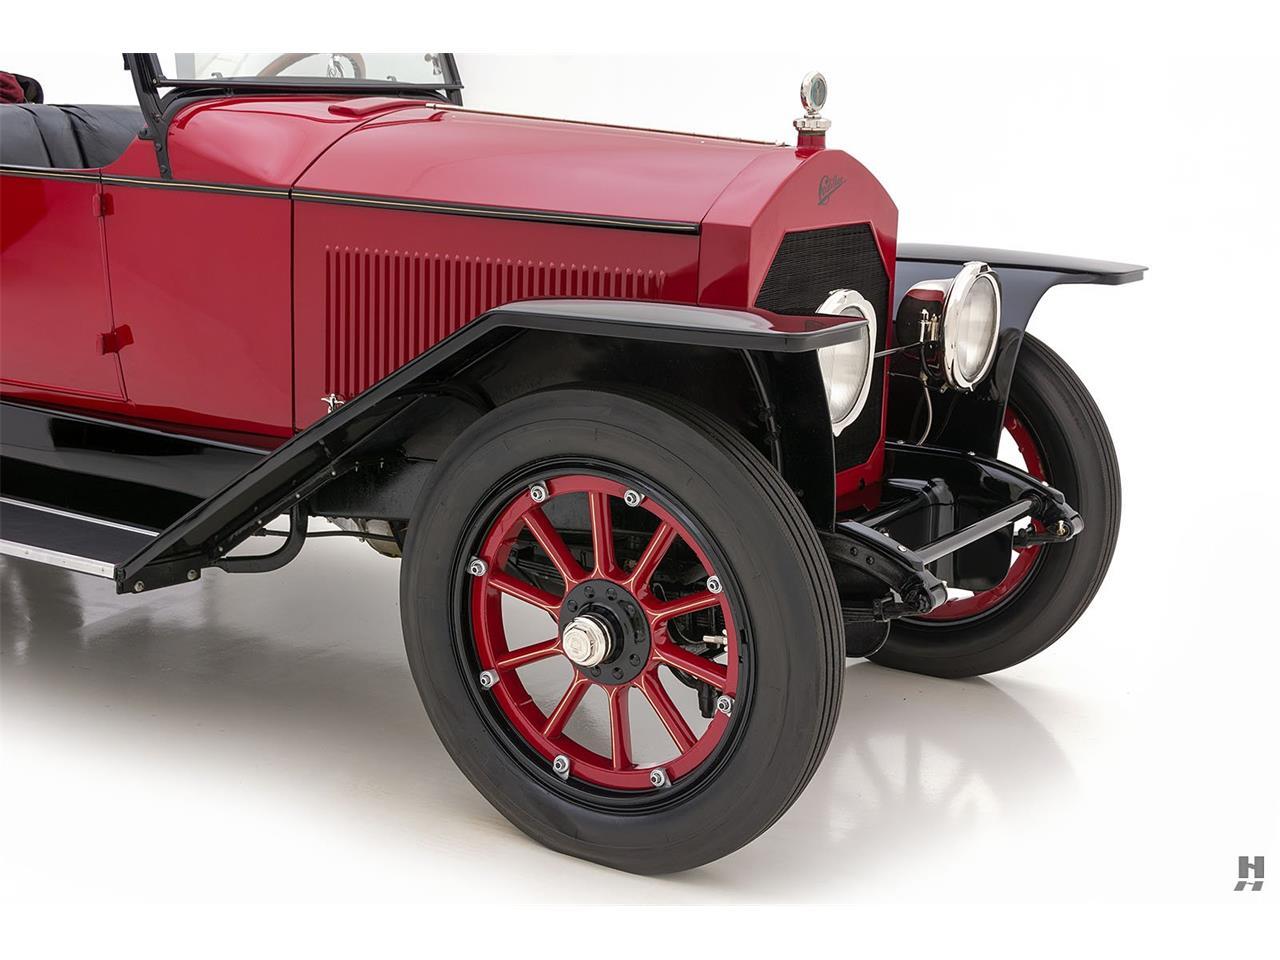 1919 Cadillac Type 57 (CC-1419112) for sale in Saint Louis, Missouri